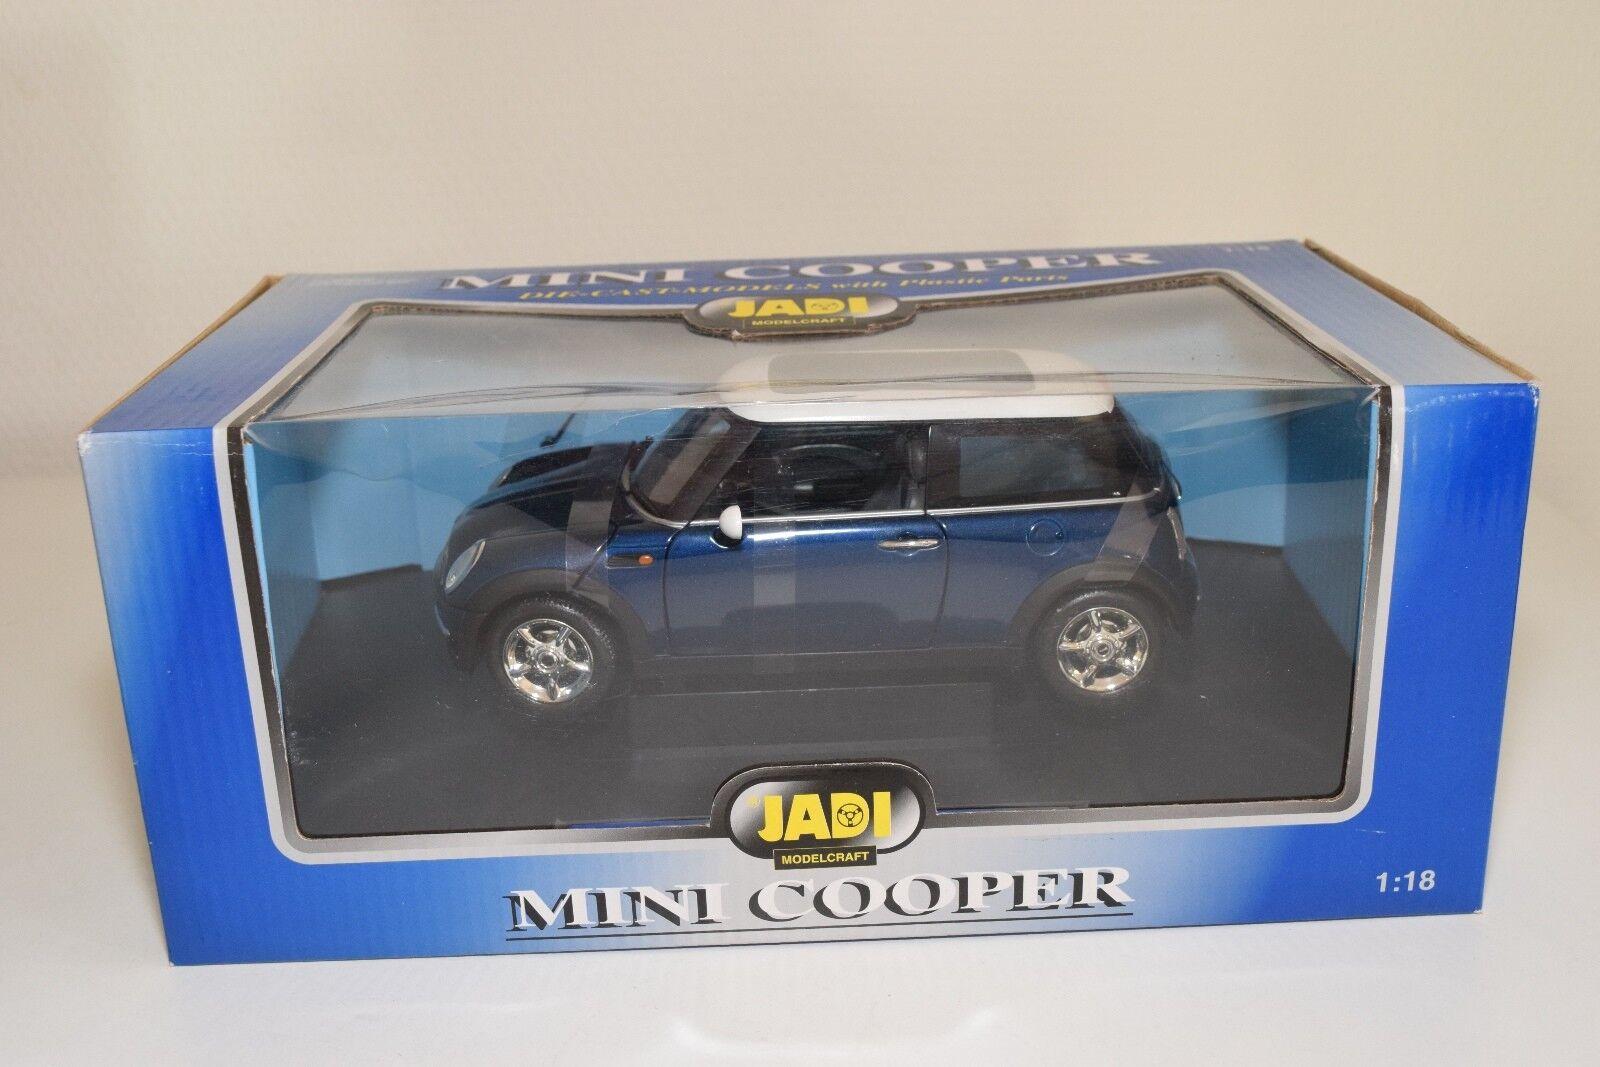 T 1:18 JADI NEW MINI COOPER METALLIC BLUE WITH WHITE ROOF MINT BOXED